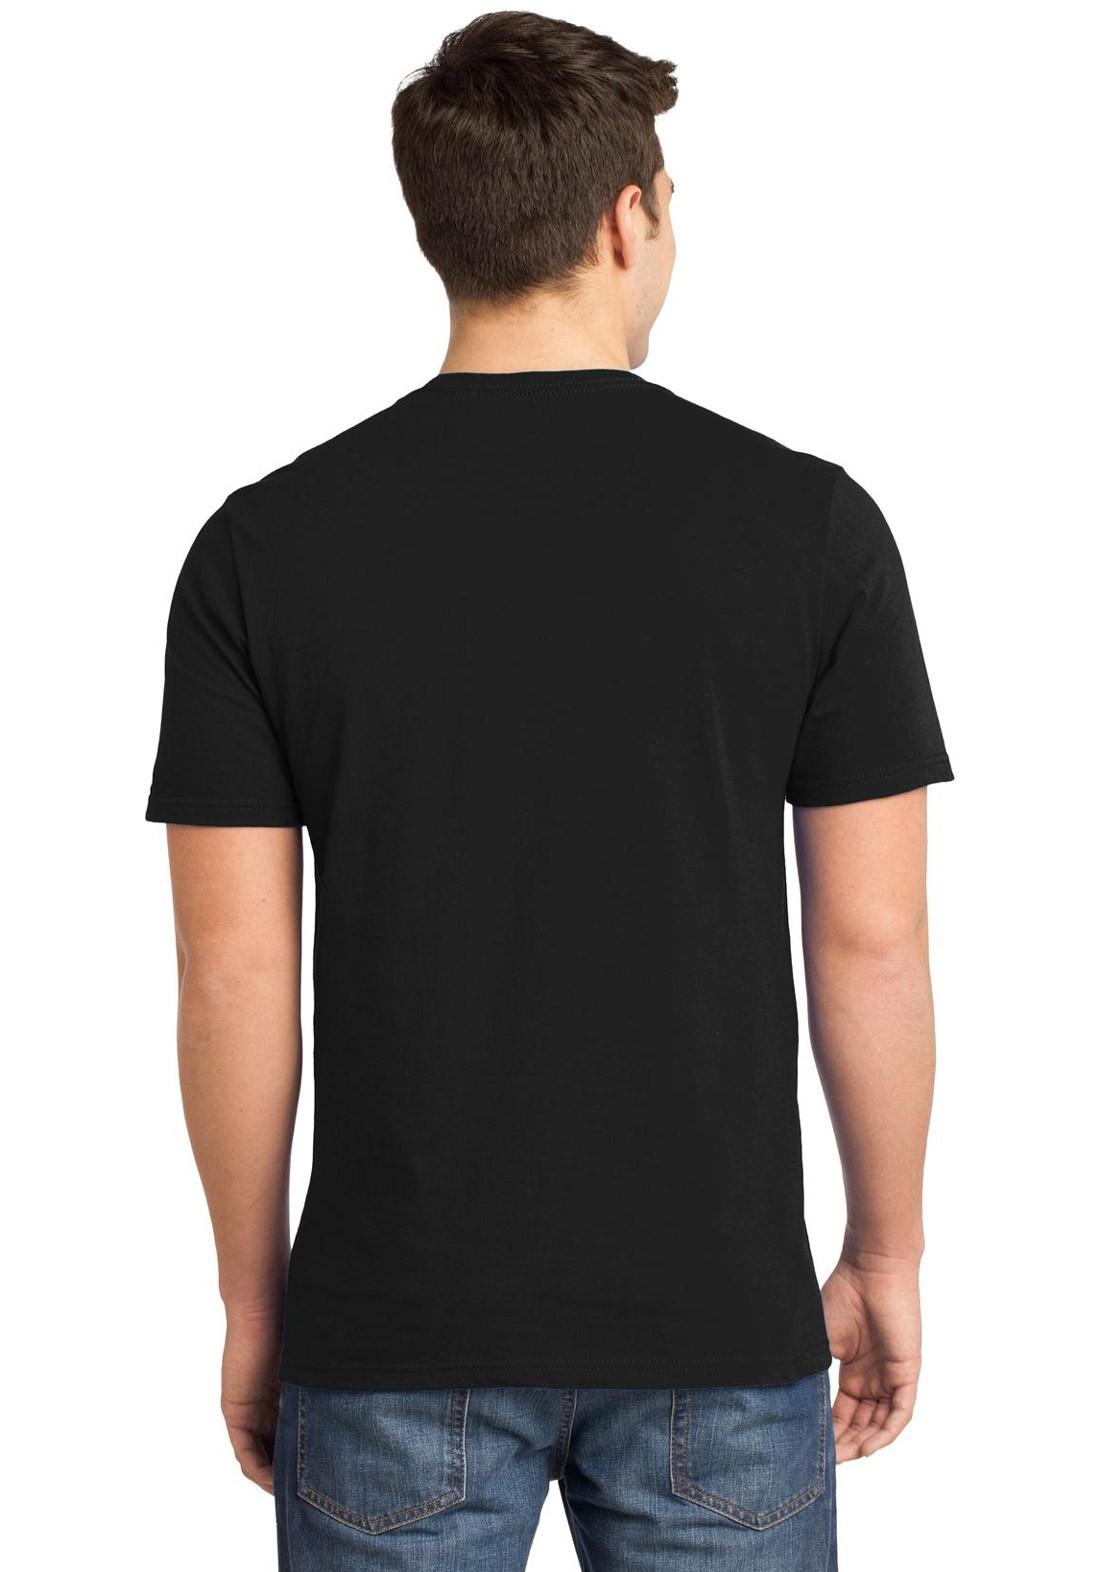 Camiseta Masculina I Love Beer ER_019